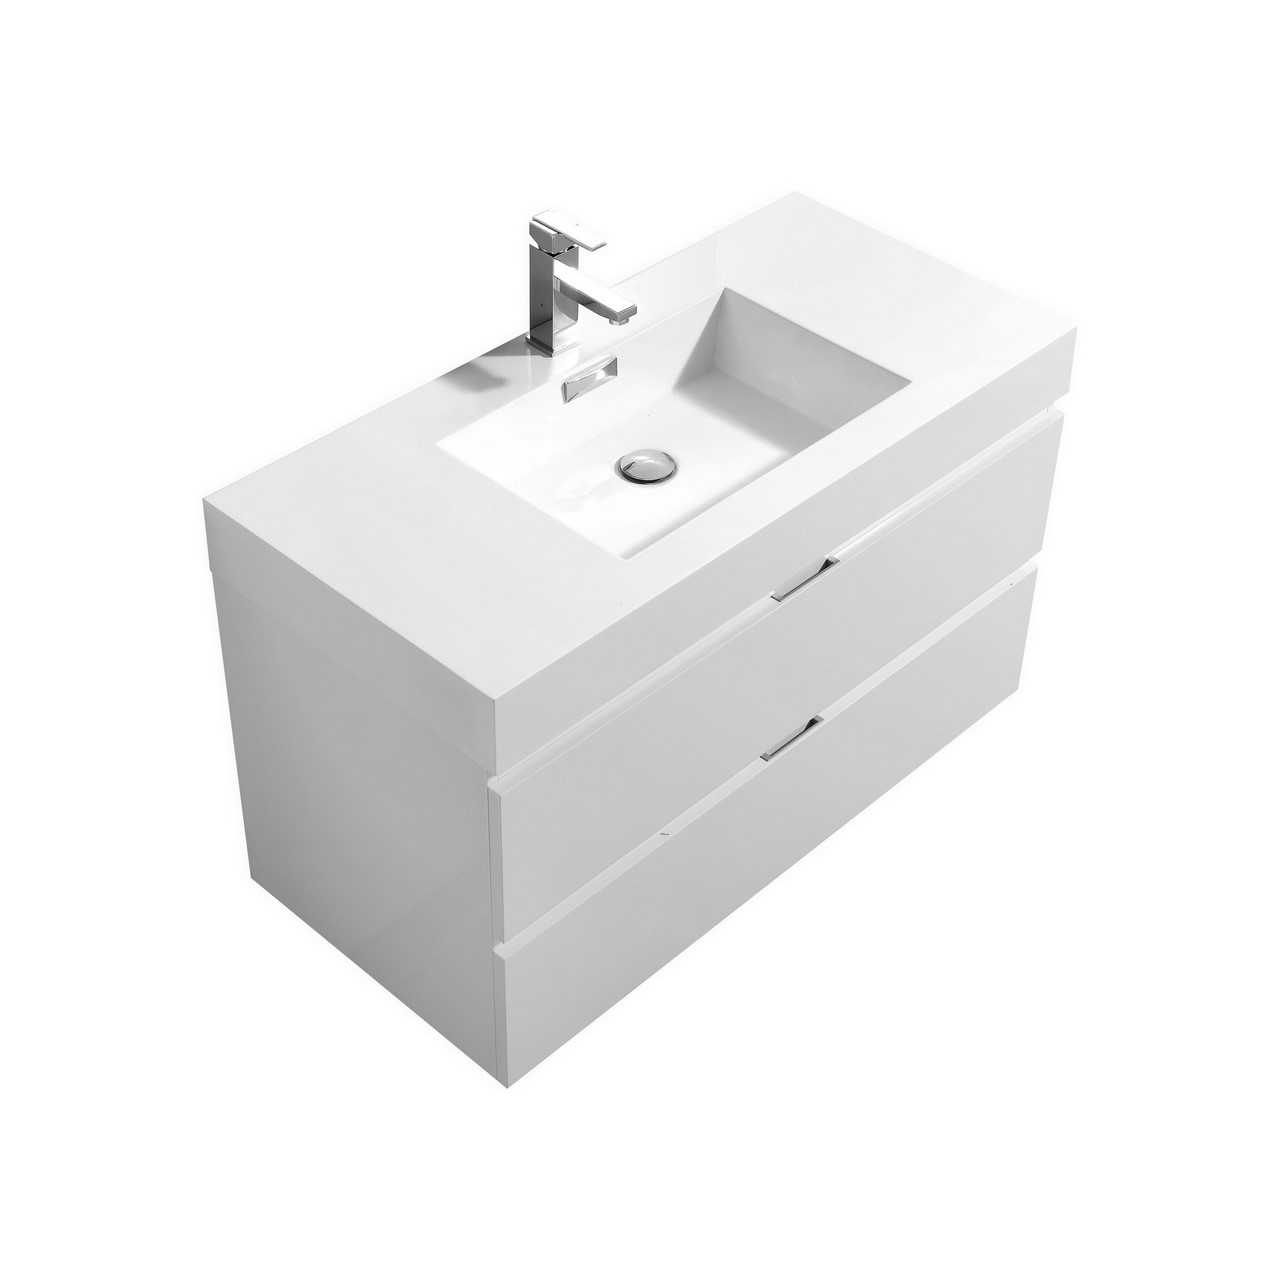 Bliss 40 High Gloss White Wall Mount Modern Bathroom Vanity